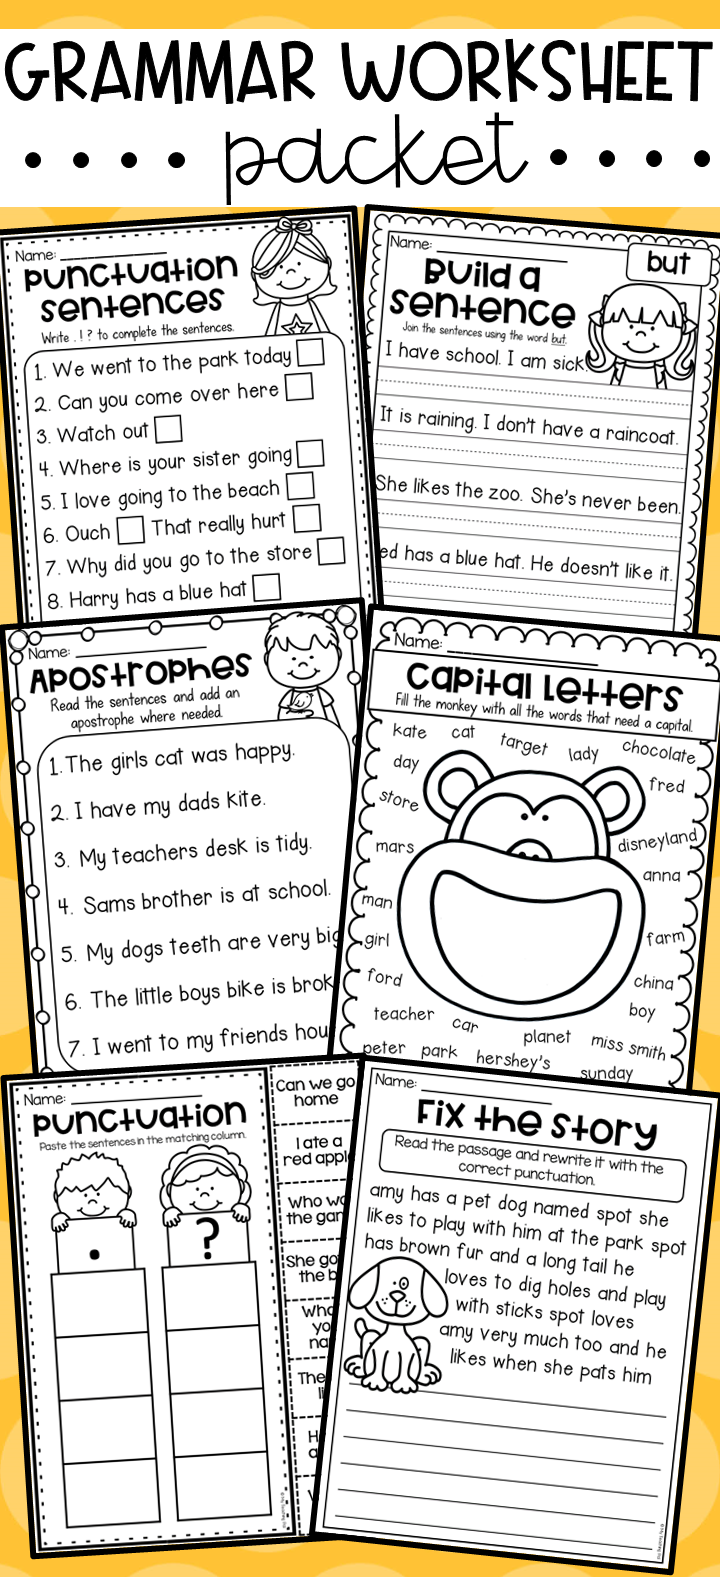 grammar worksheet packet sentences punctuation capitals conjunctions more intervention. Black Bedroom Furniture Sets. Home Design Ideas